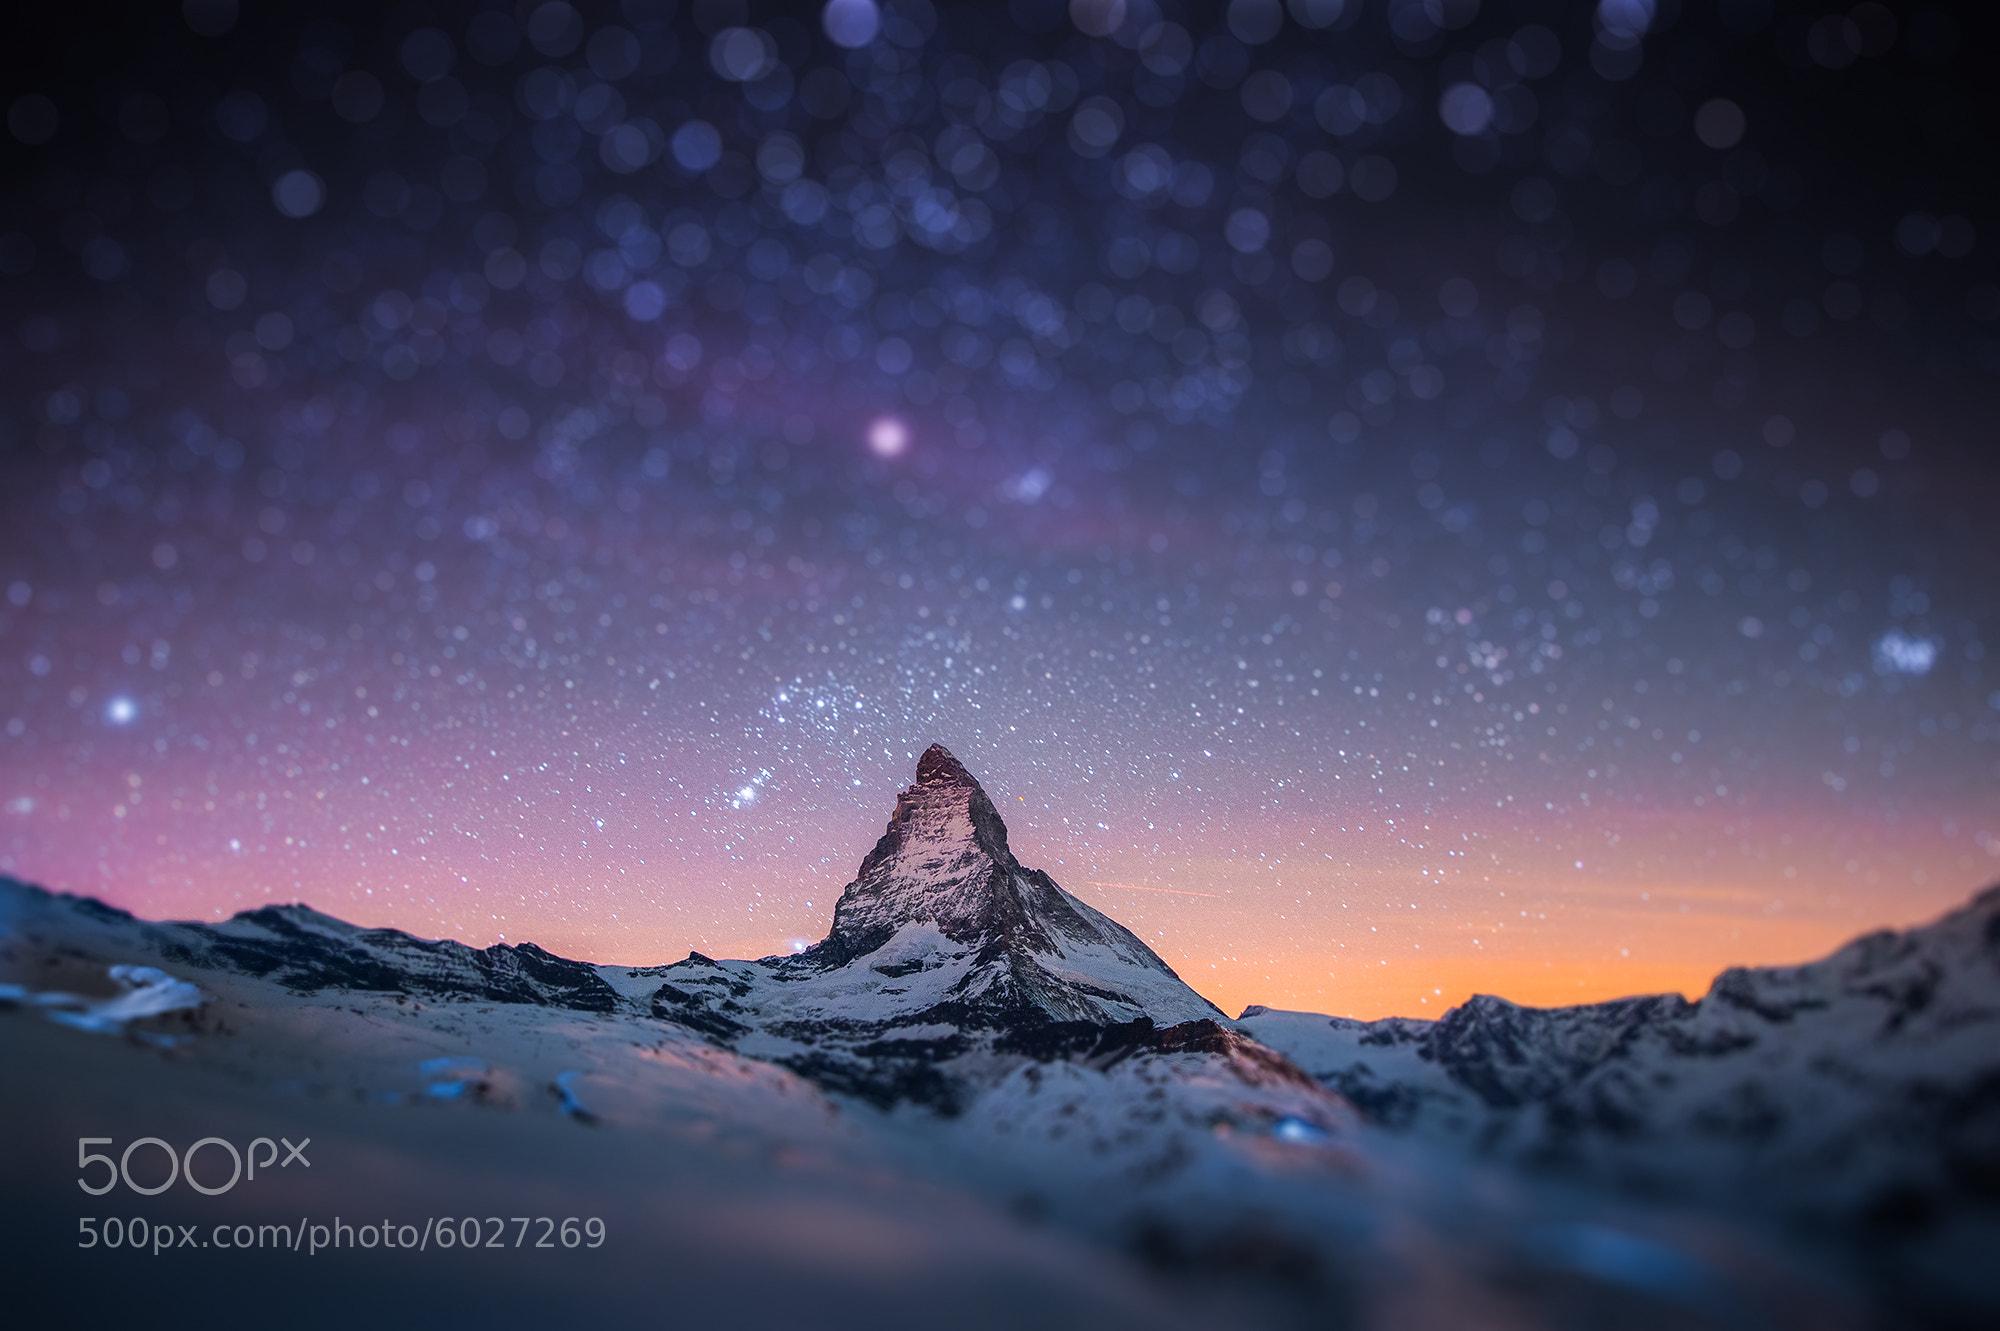 Photograph Mini Matterhorn by Coolbiere. A. on 500px